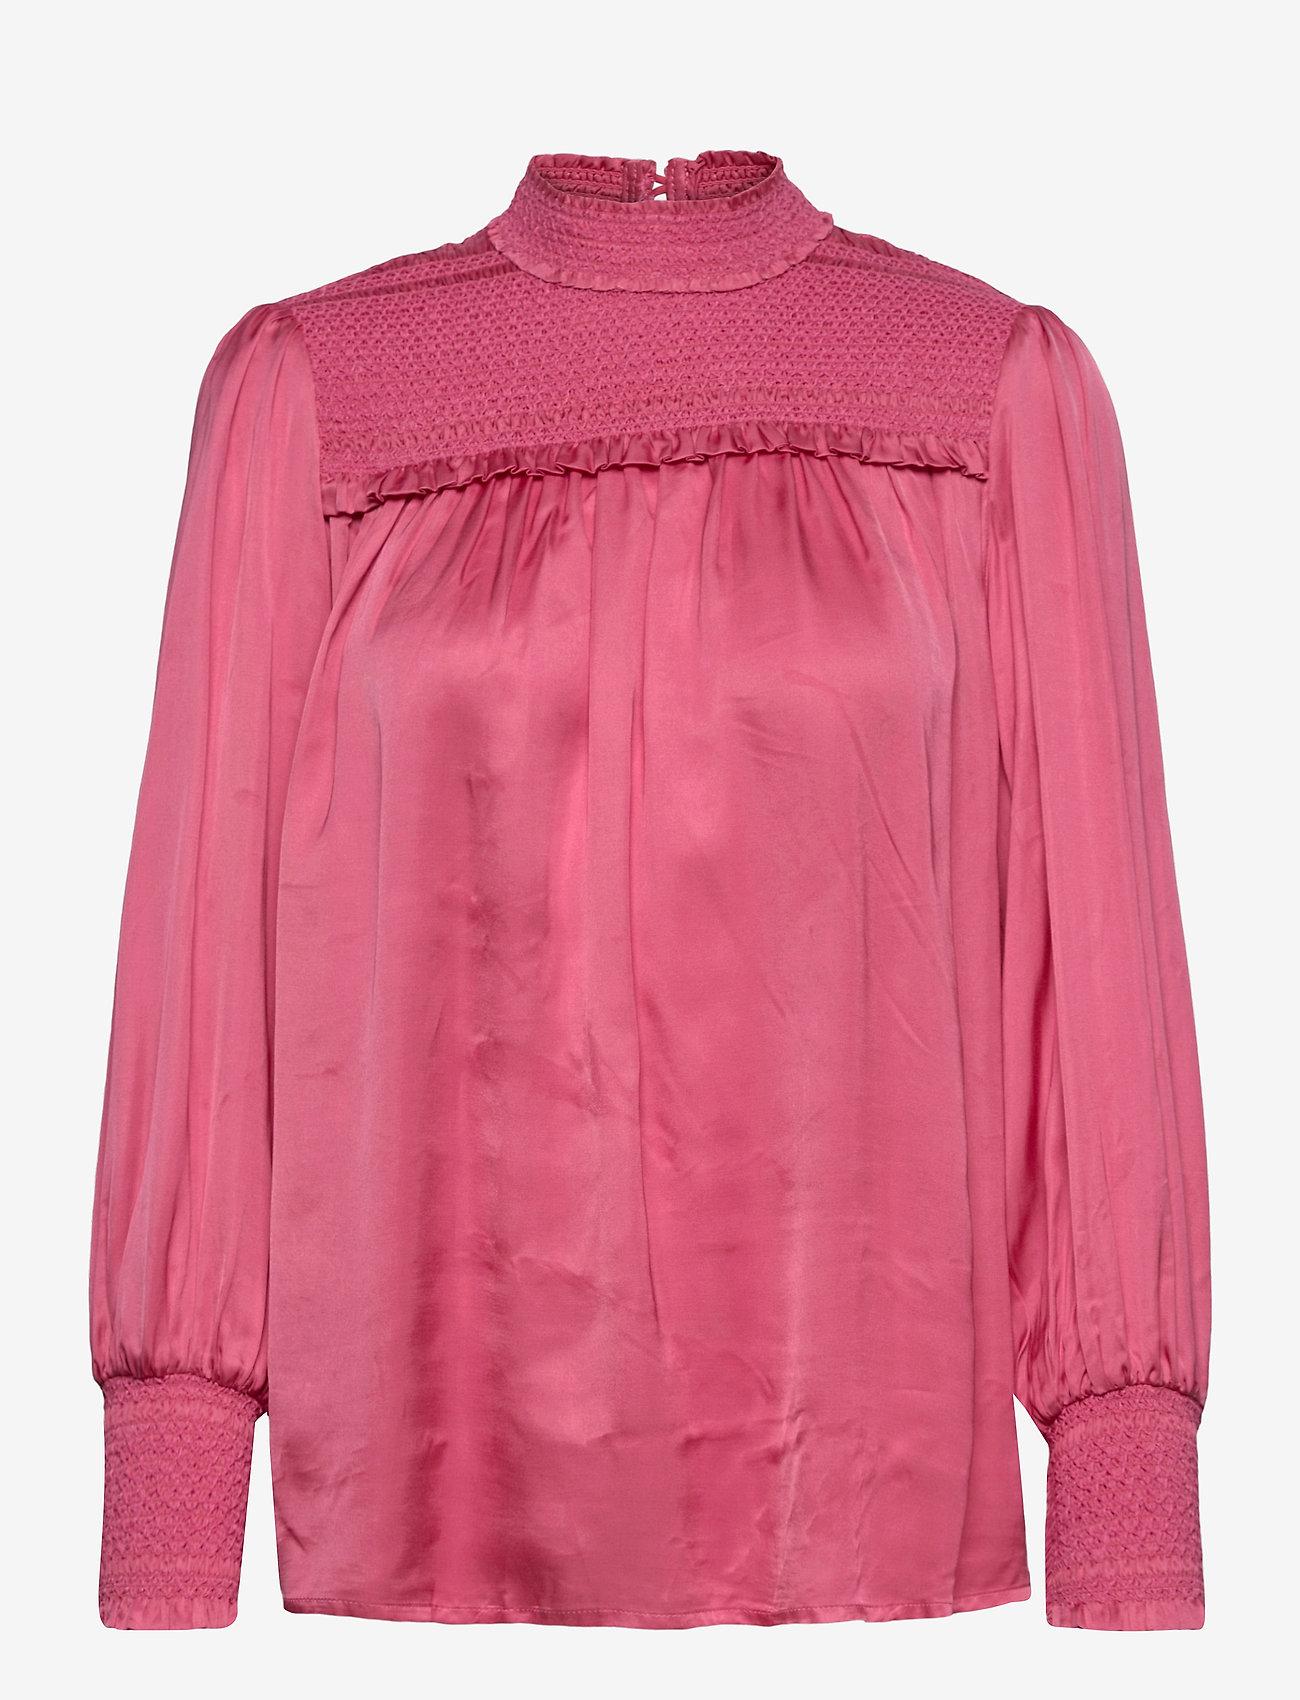 By Malina - Shirley blouse - långärmade blusar - ballet pink - 1